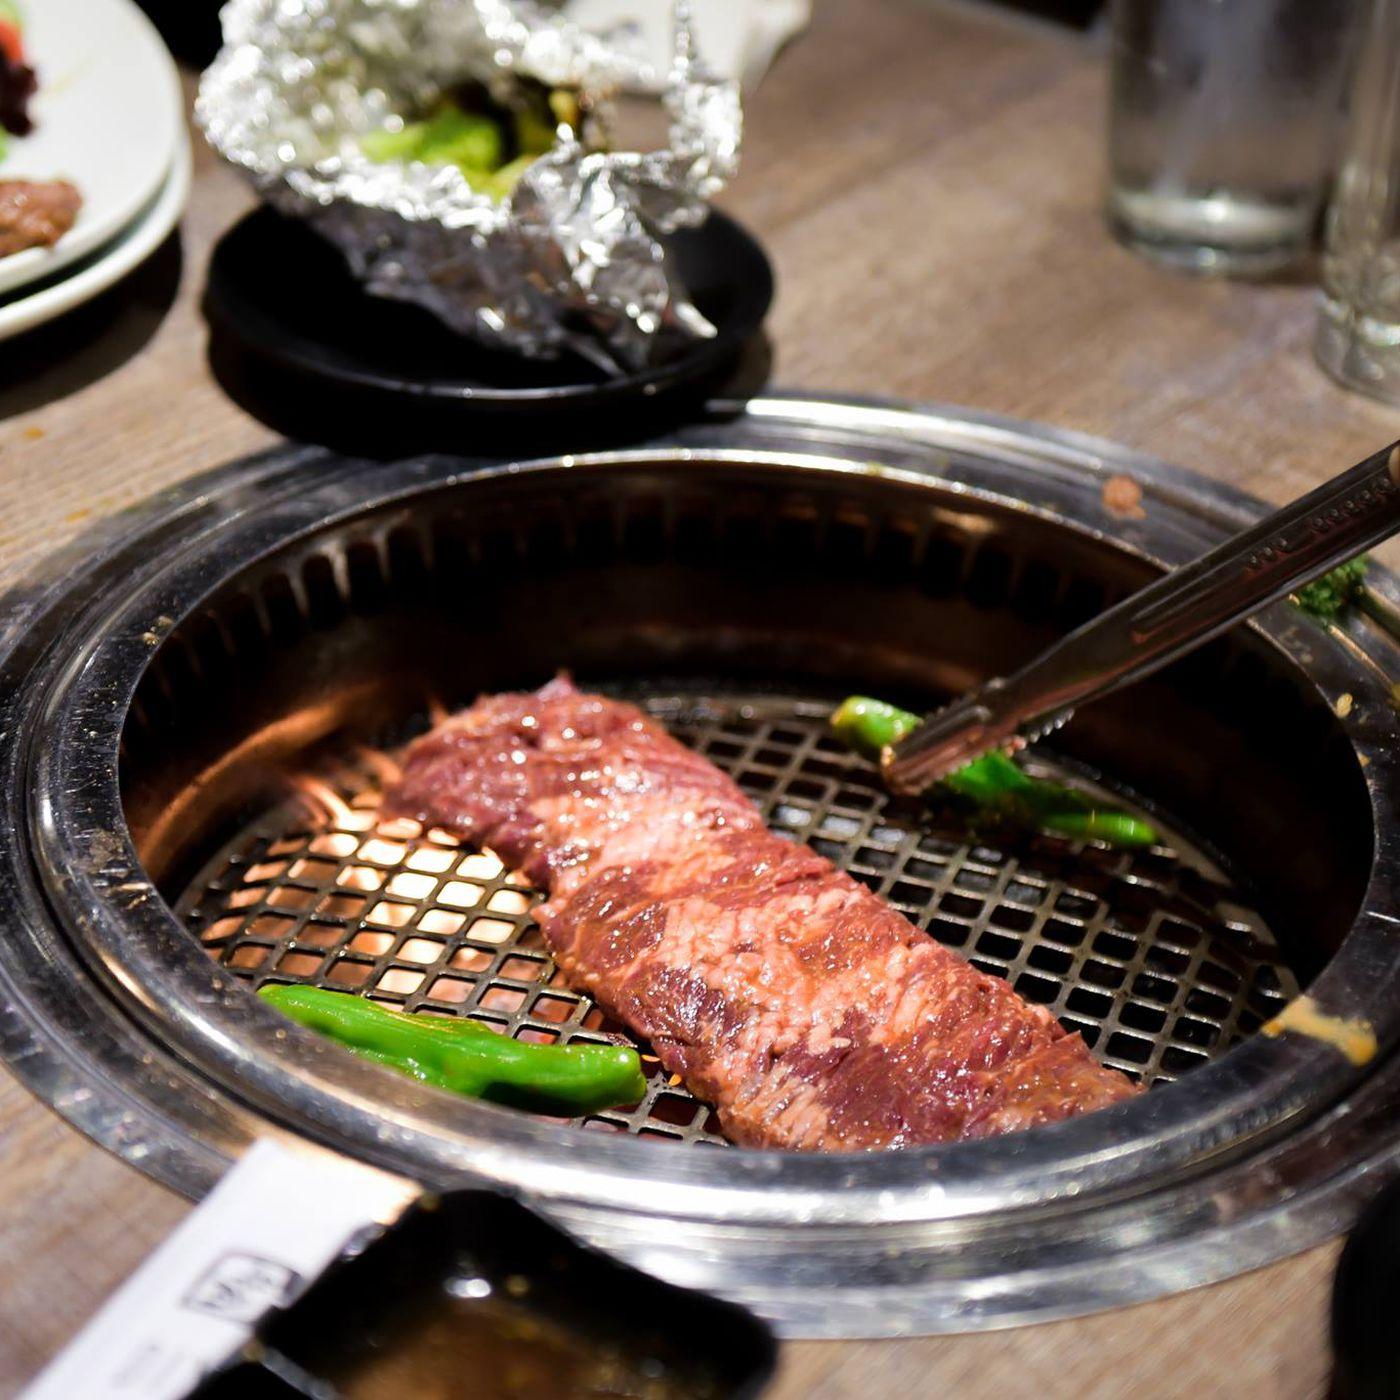 Japanese Barbecue Chain Gyu Kaku Opens Austin Restaurant Eater Austin